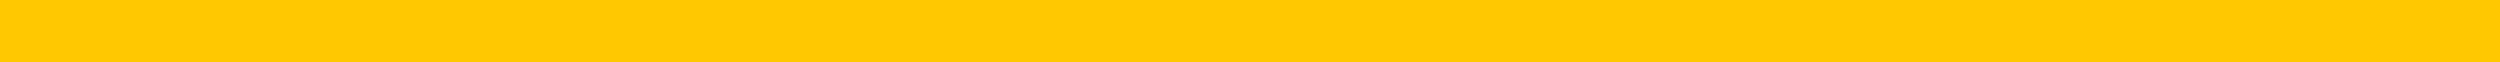 Yellow Line.jpg